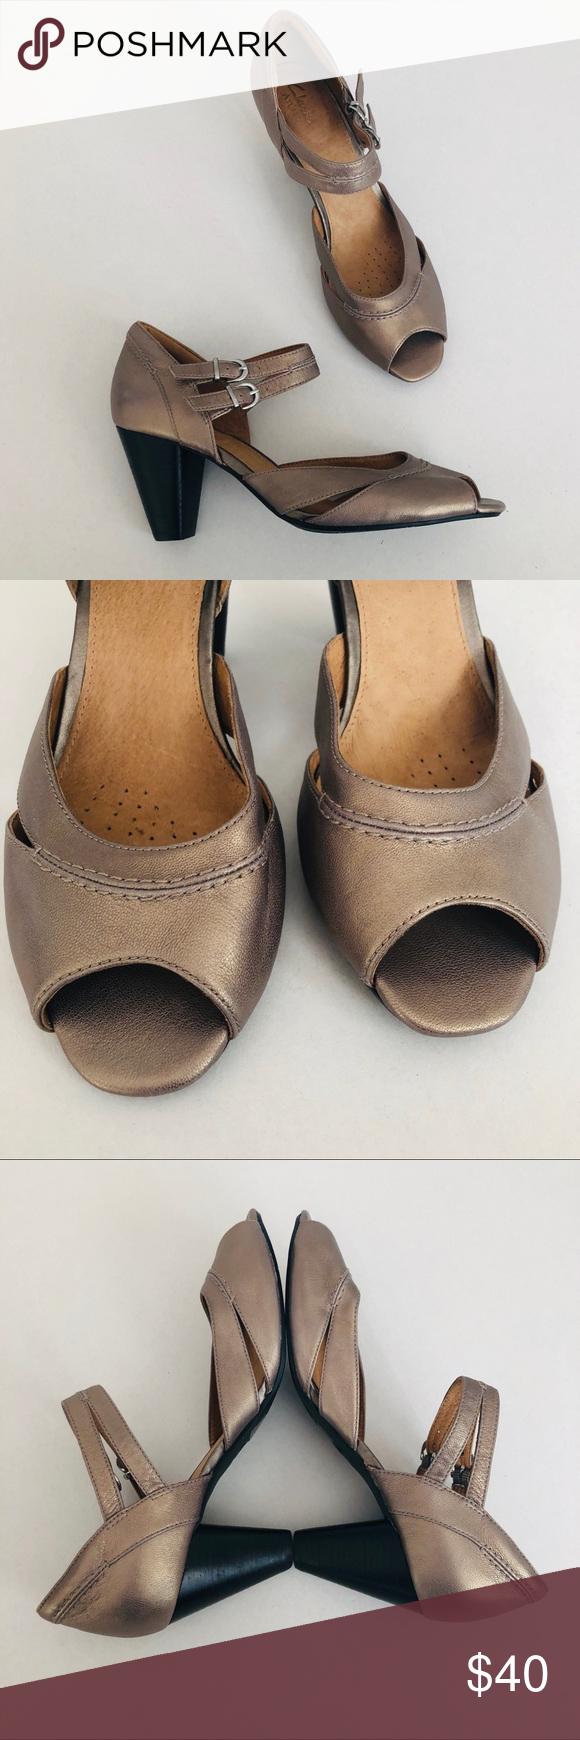 Active Air Metallic Peep-toe Heels